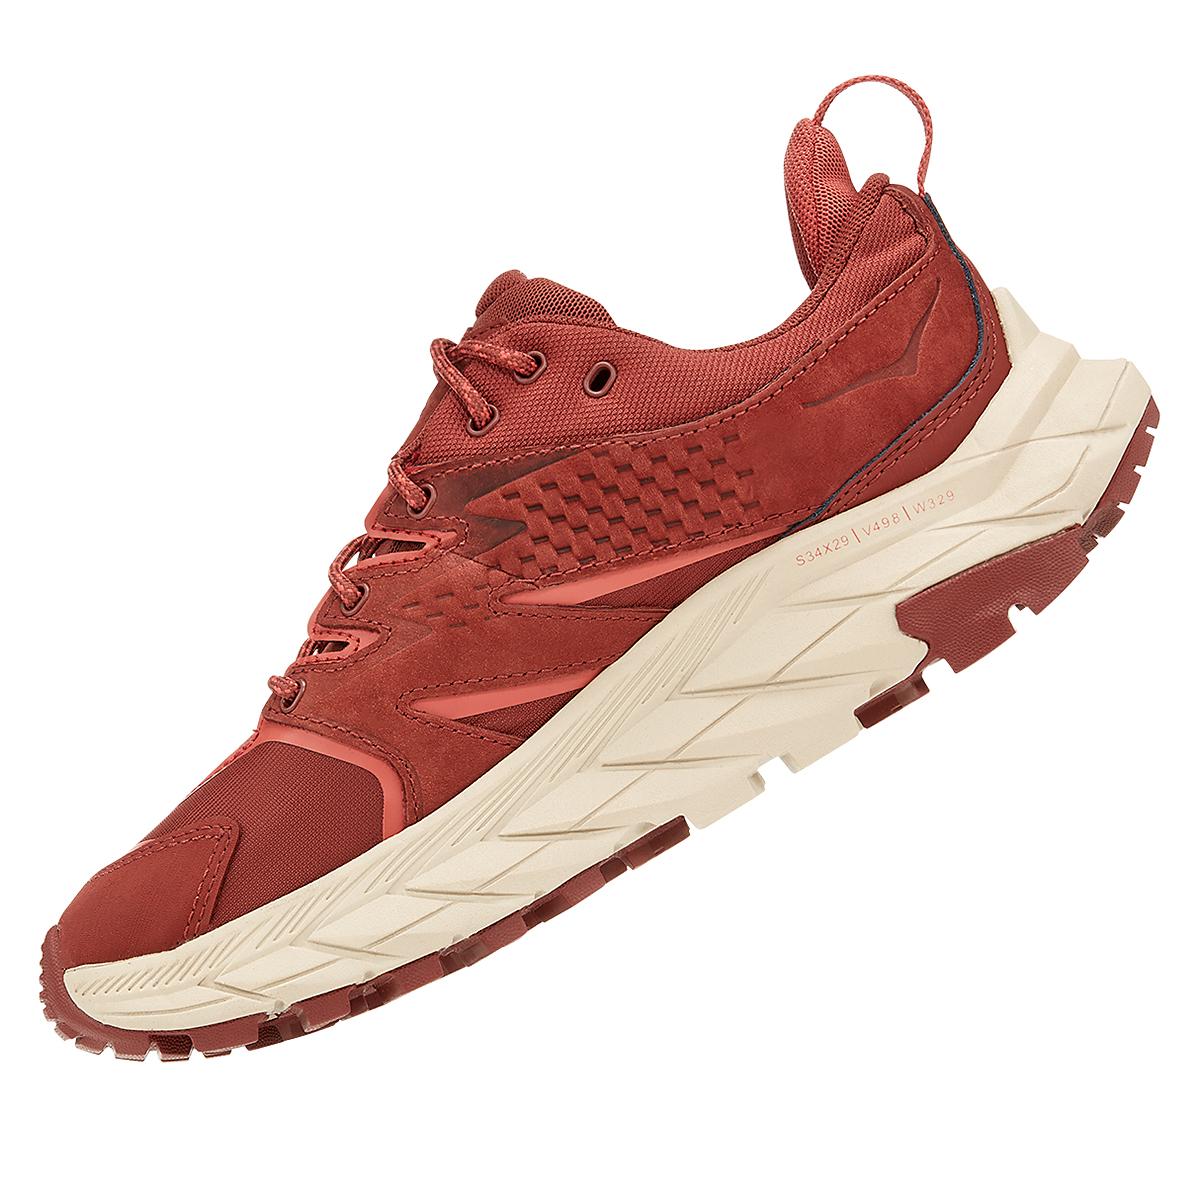 Women's Hoka One One Anacapa Low Gore-Tex Trail Running Shoe - Color: Cherry Mahogany - Size: 5 - Width: Regular, Cherry Mahogany, large, image 4